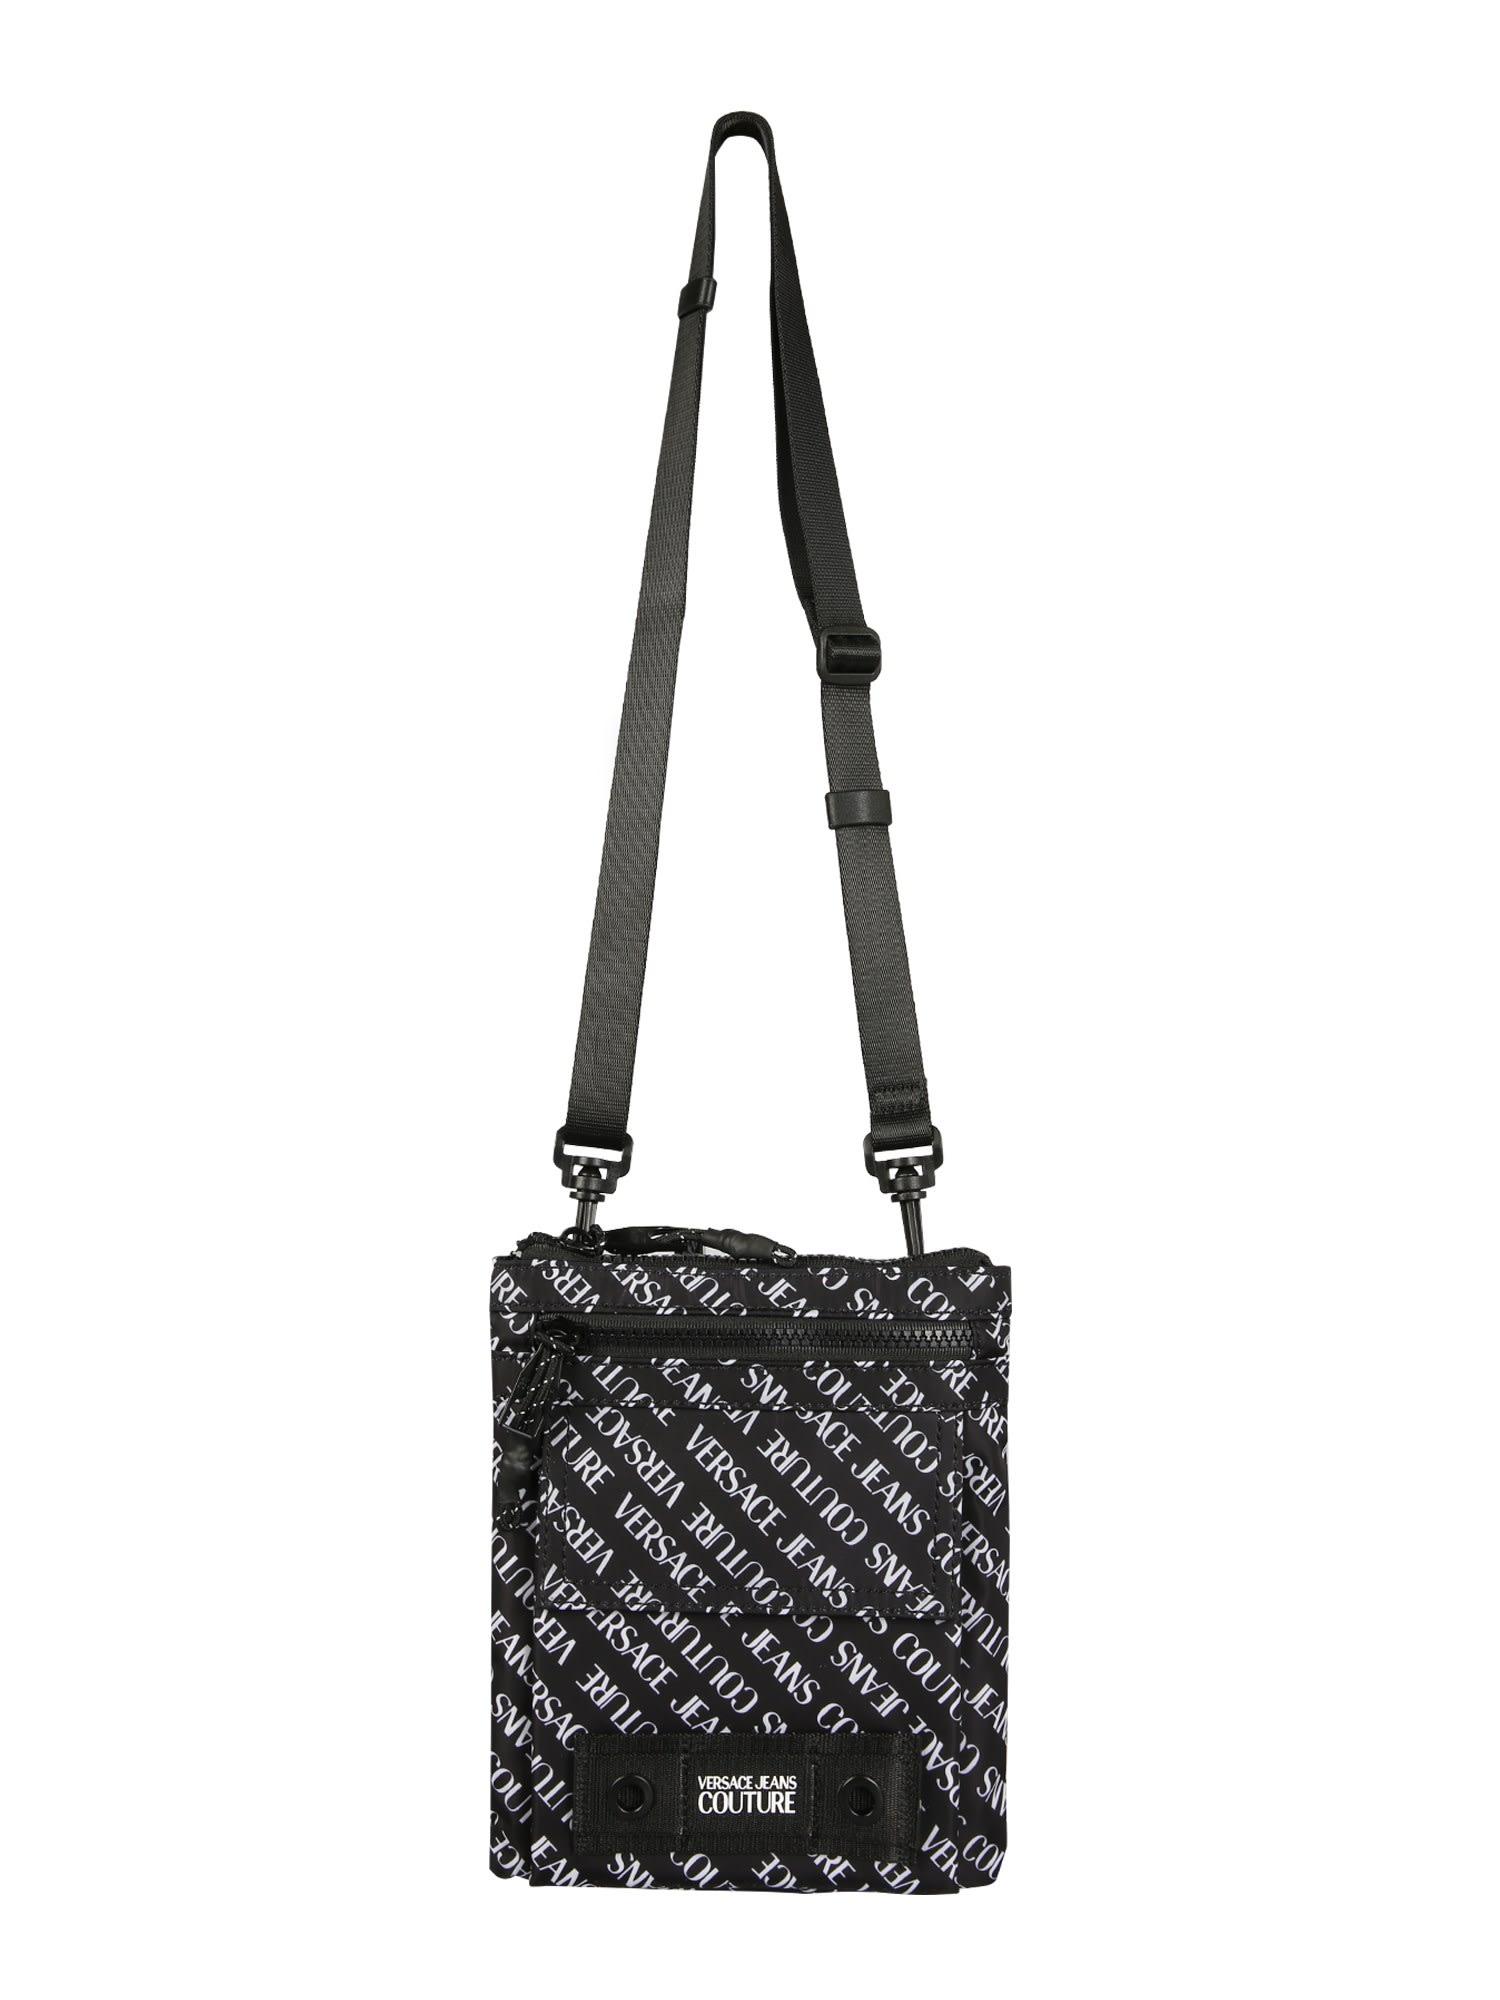 Versace Jeans Couture NYLON BAG